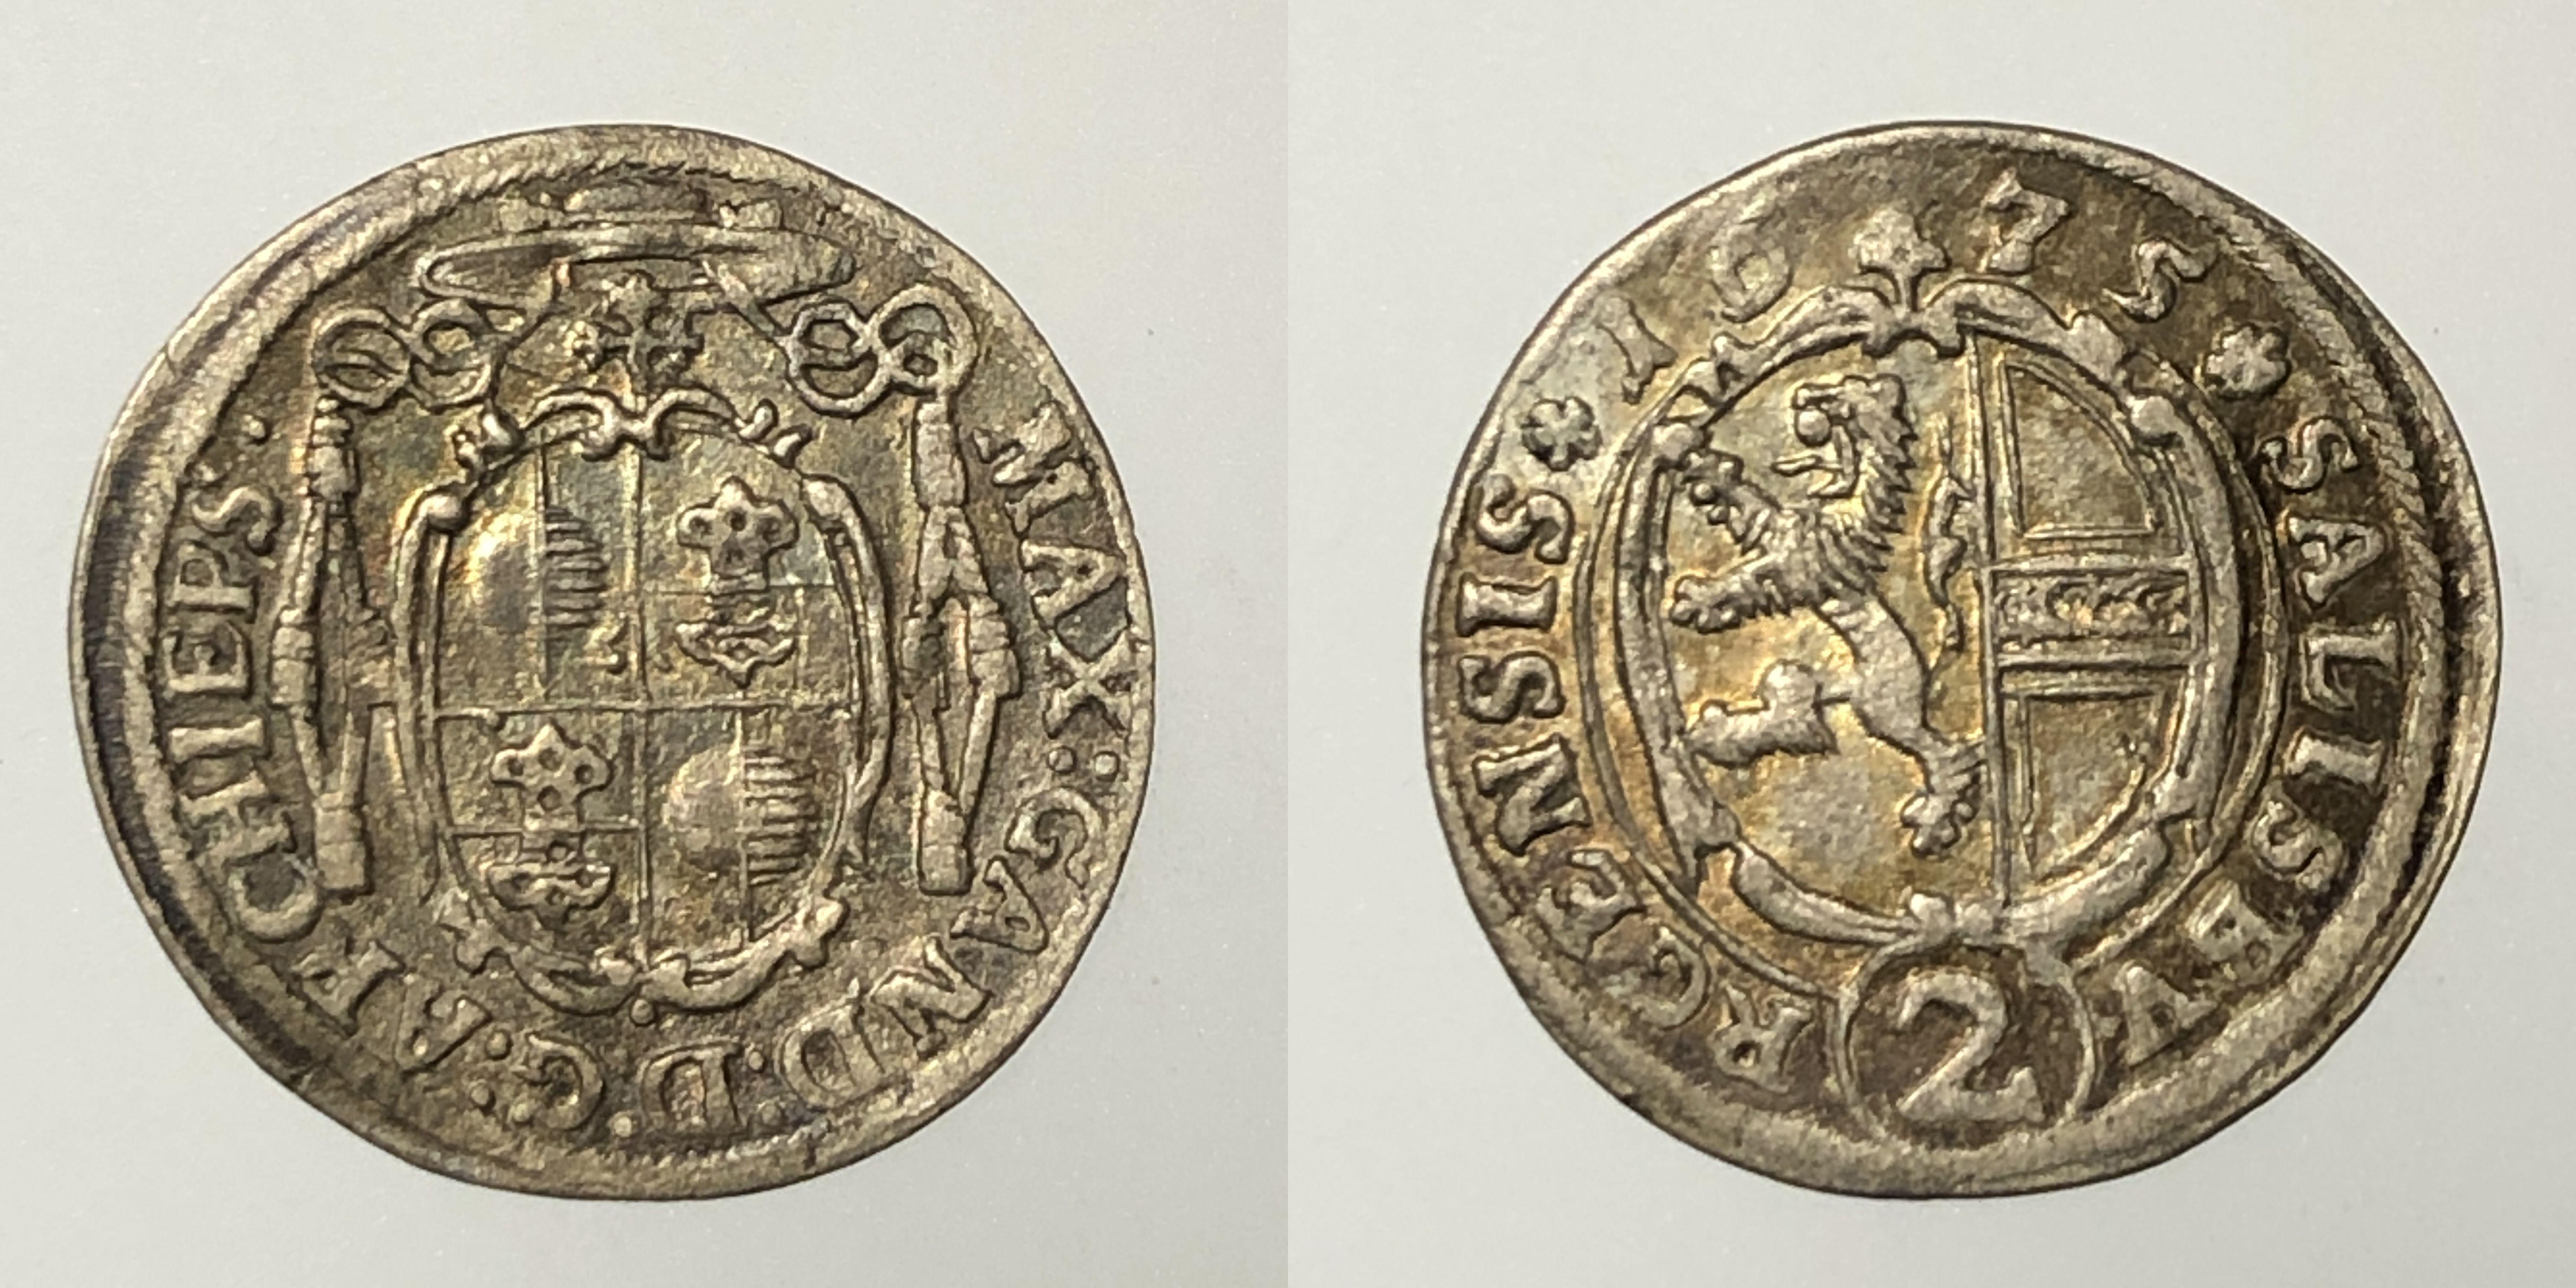 Salzburg Max Gandolph 2 Kreuzer 1675